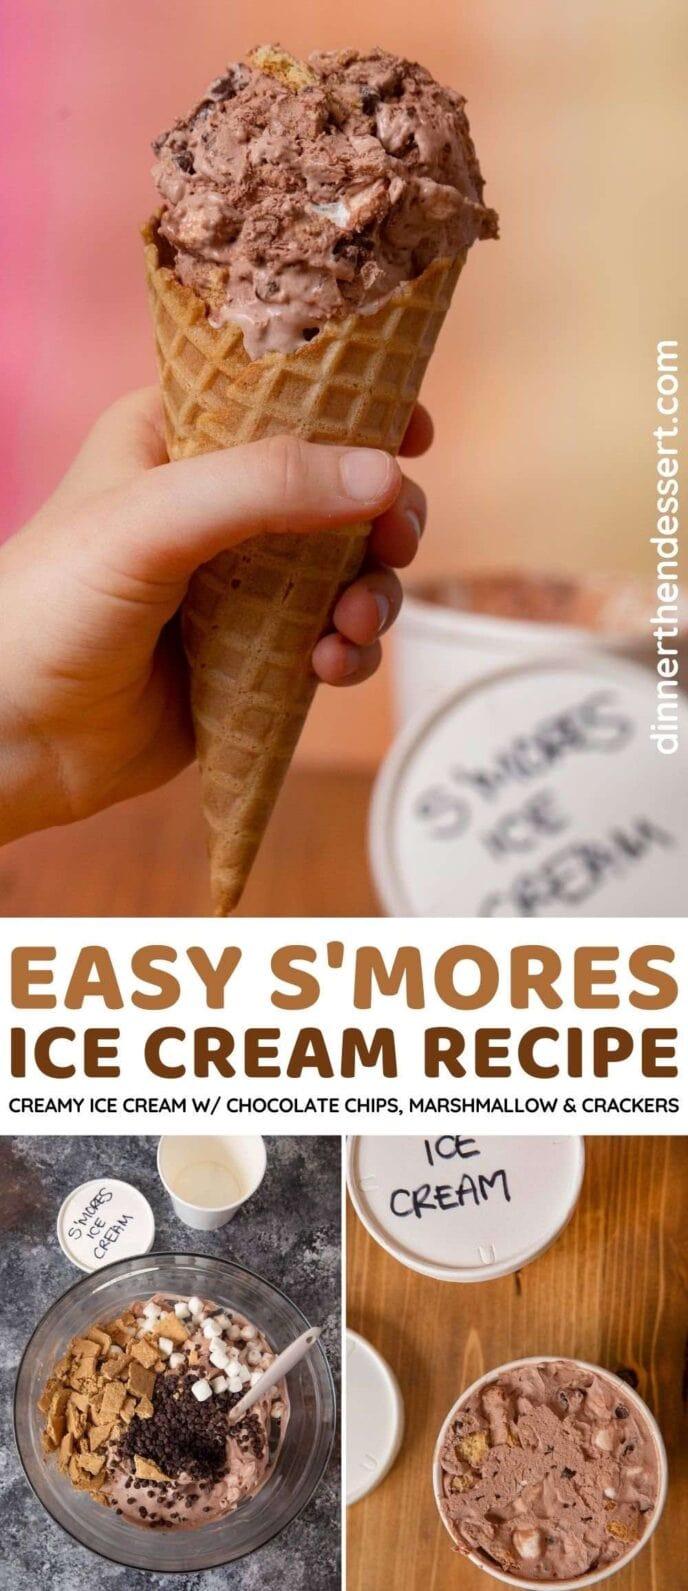 S'mores Ice Cream collage